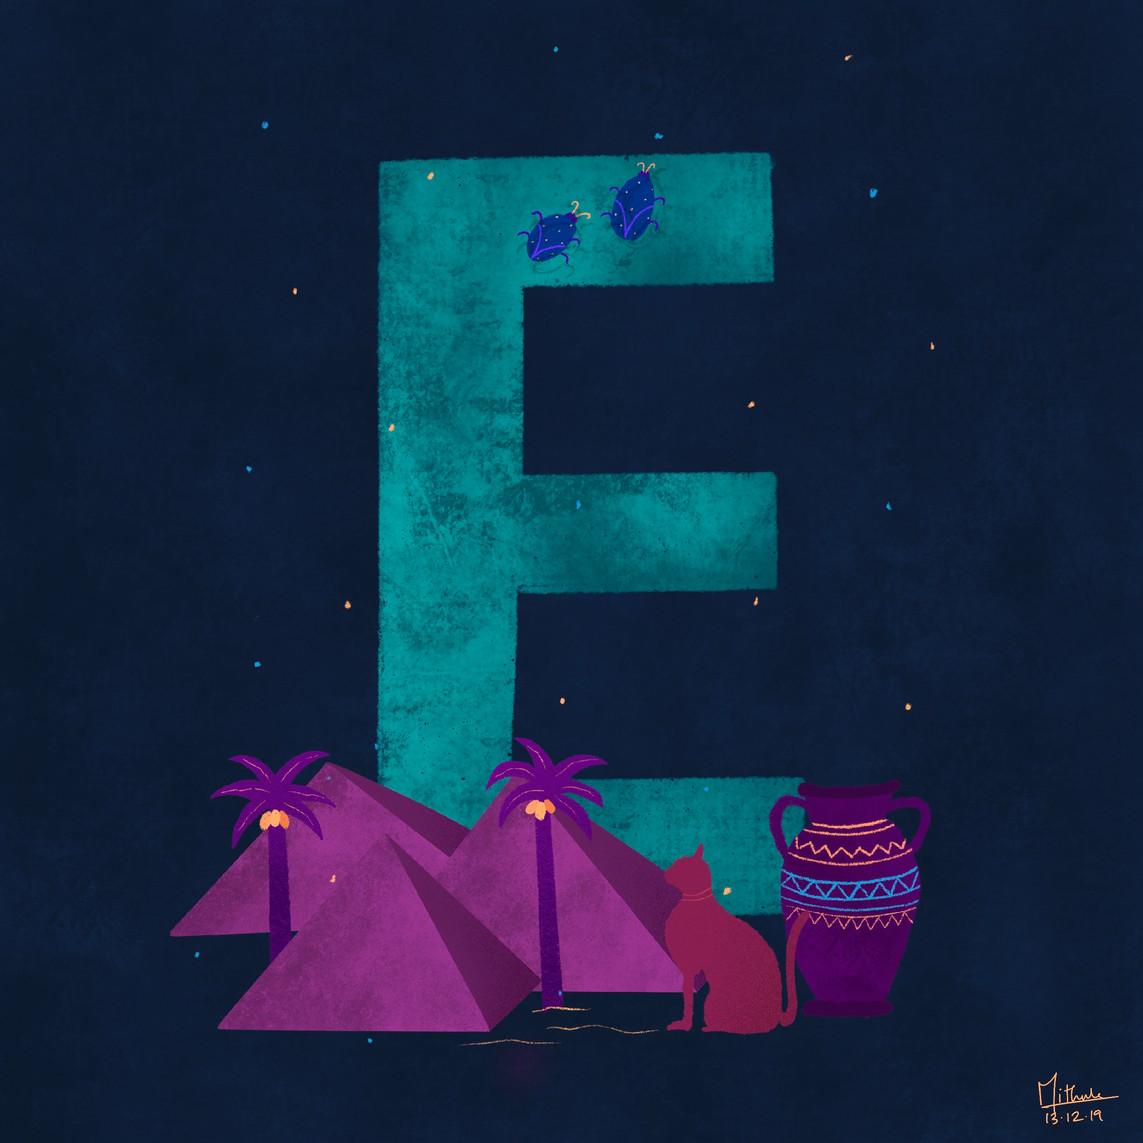 E for Egypt